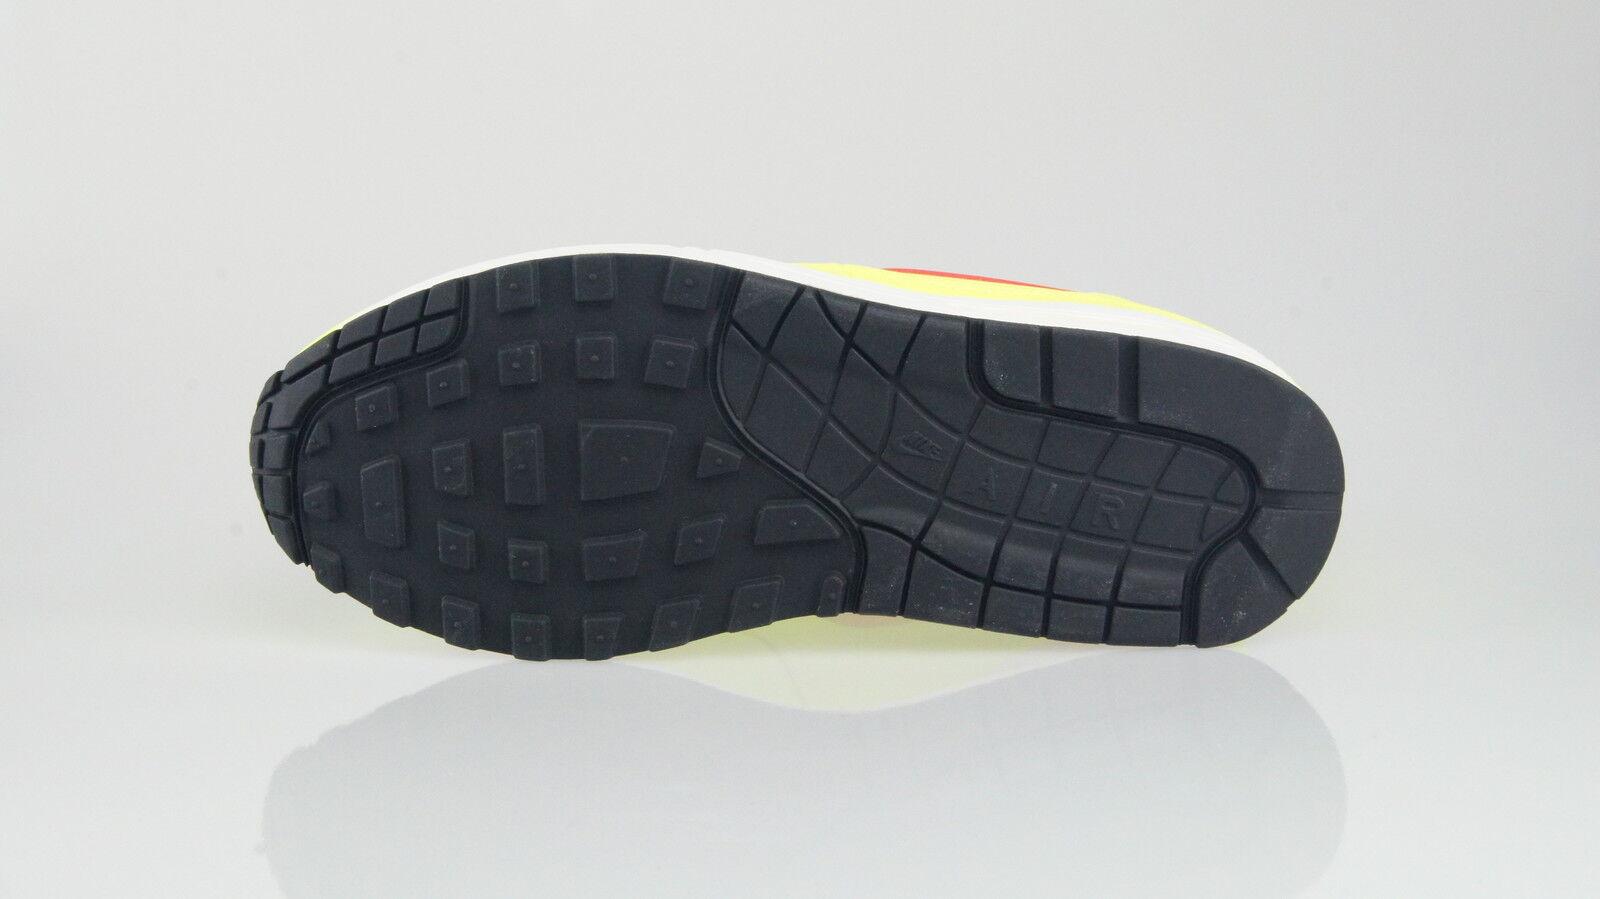 NIKE AIR MAX 1 PREMIUM Size QS Size PREMIUM 44 (10US) bfab99